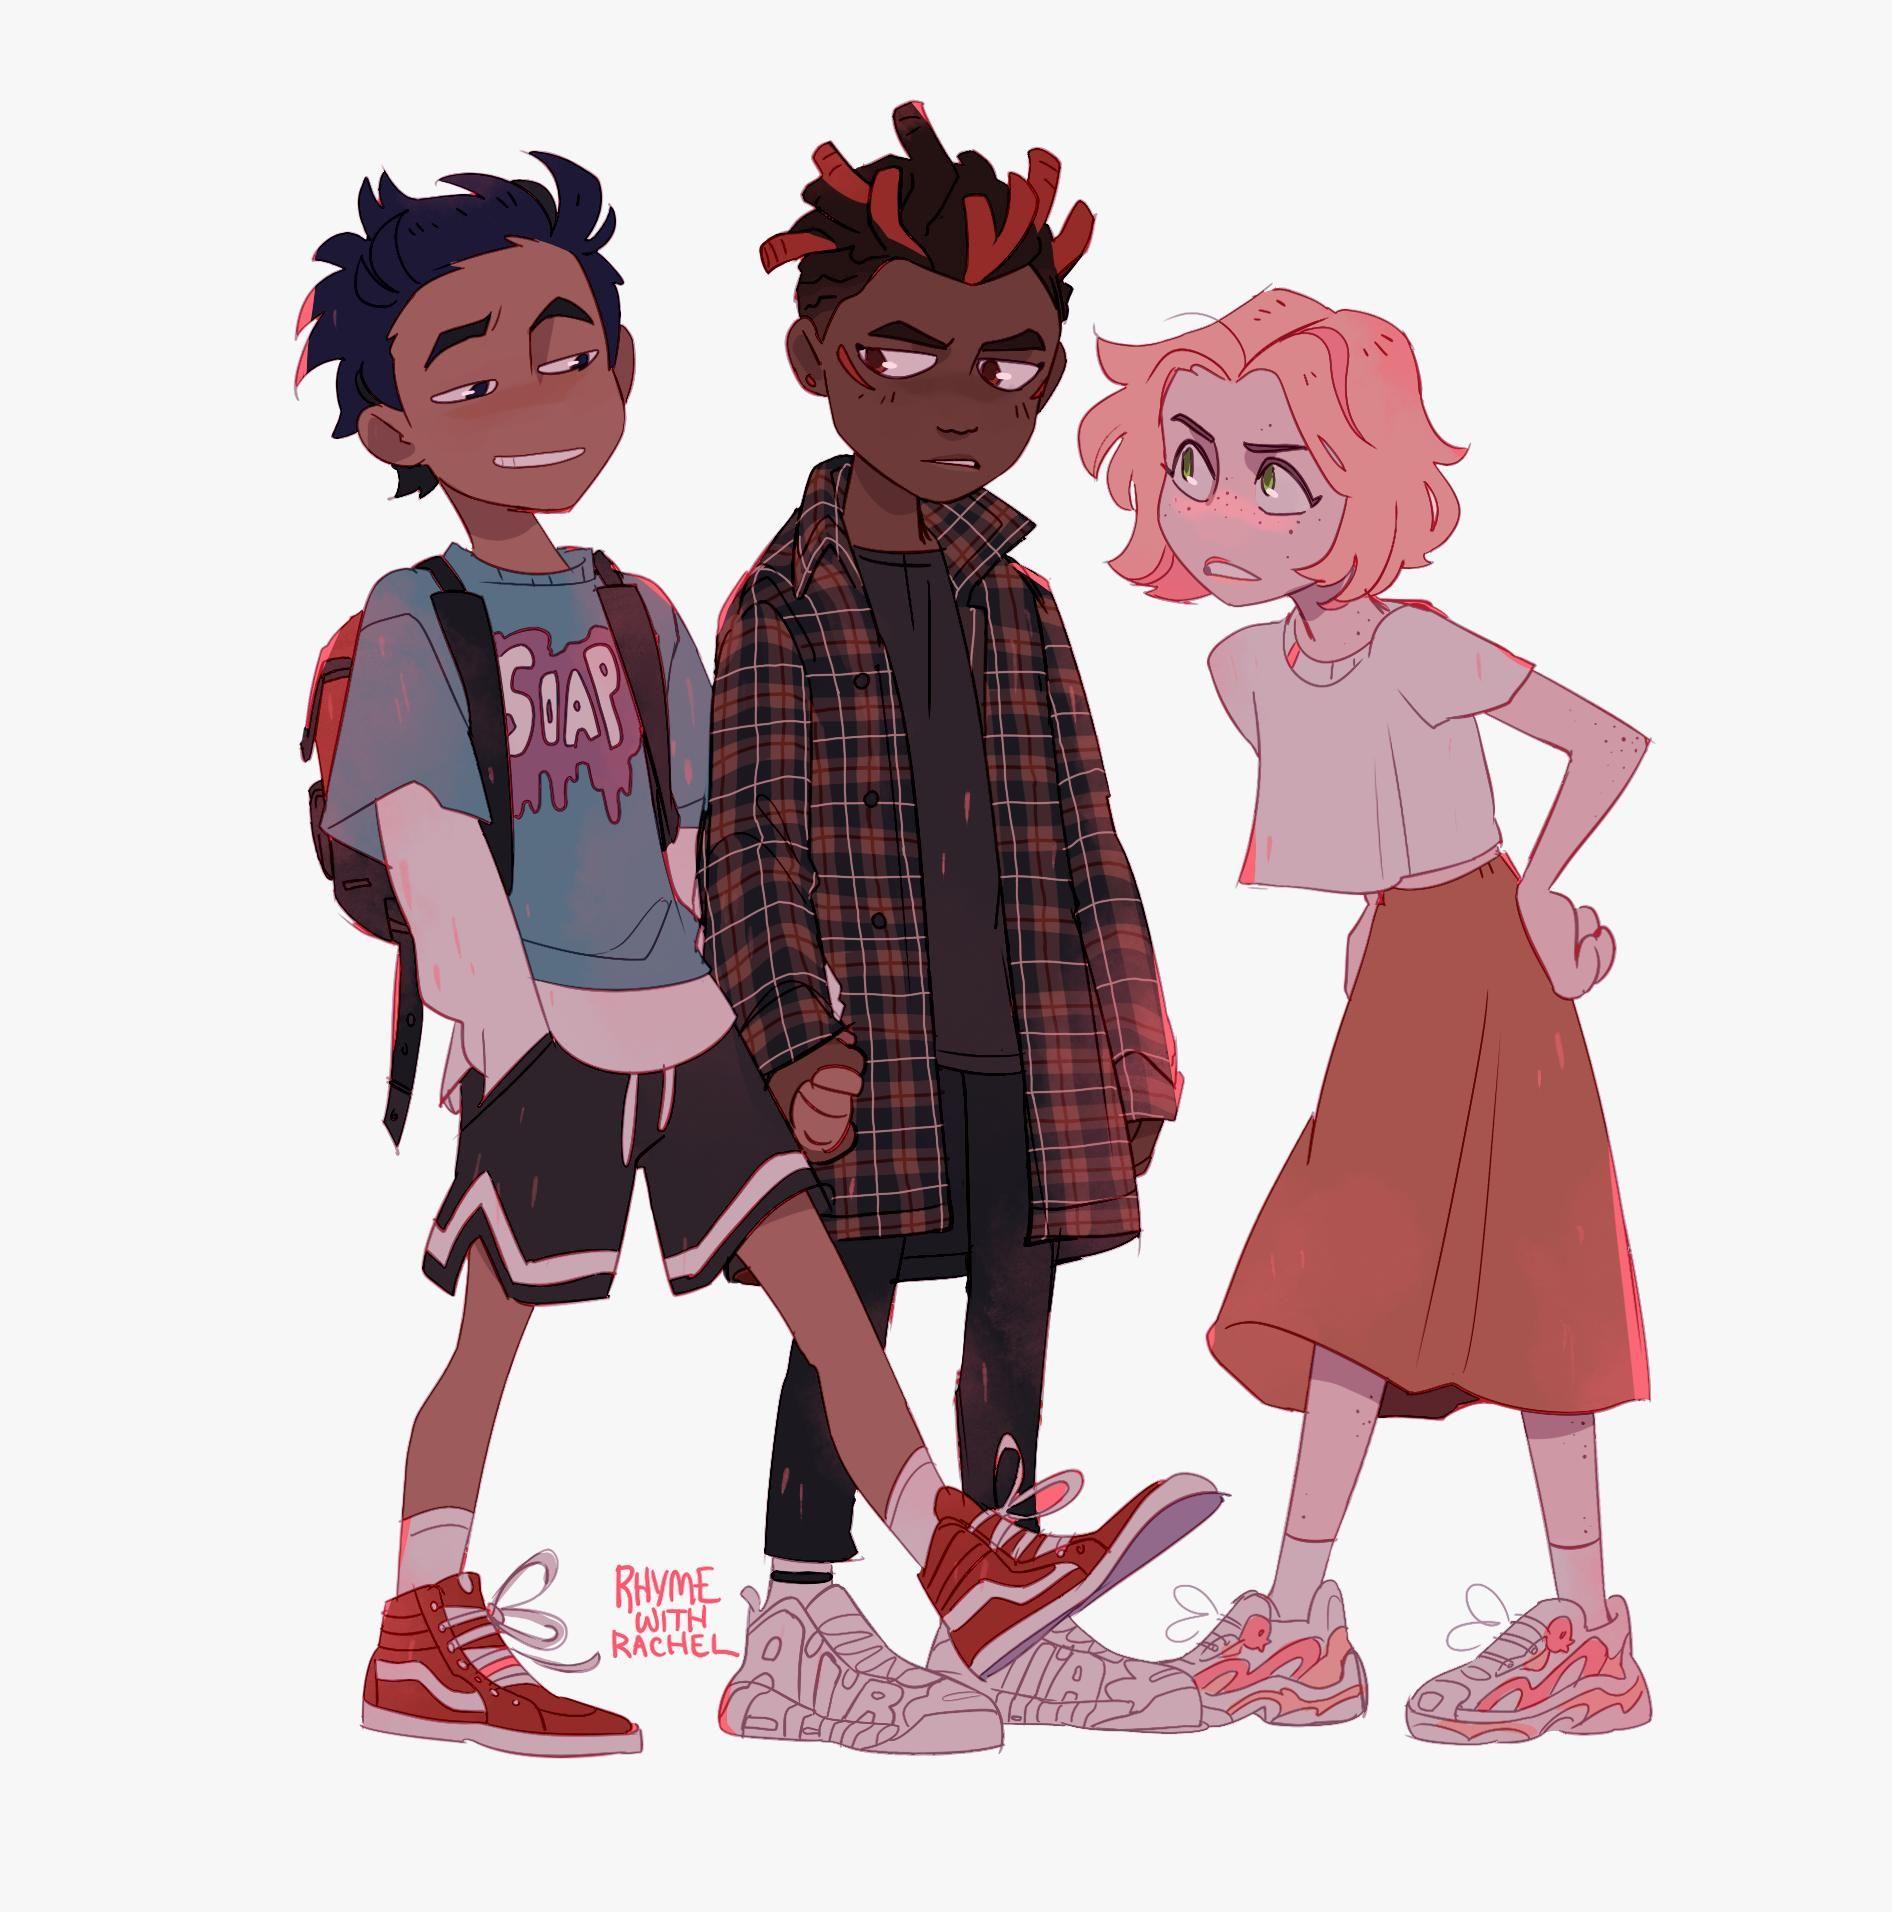 Rachel On Twitter In 2021 Character Design Cartoon Art Styles Cute Art Styles